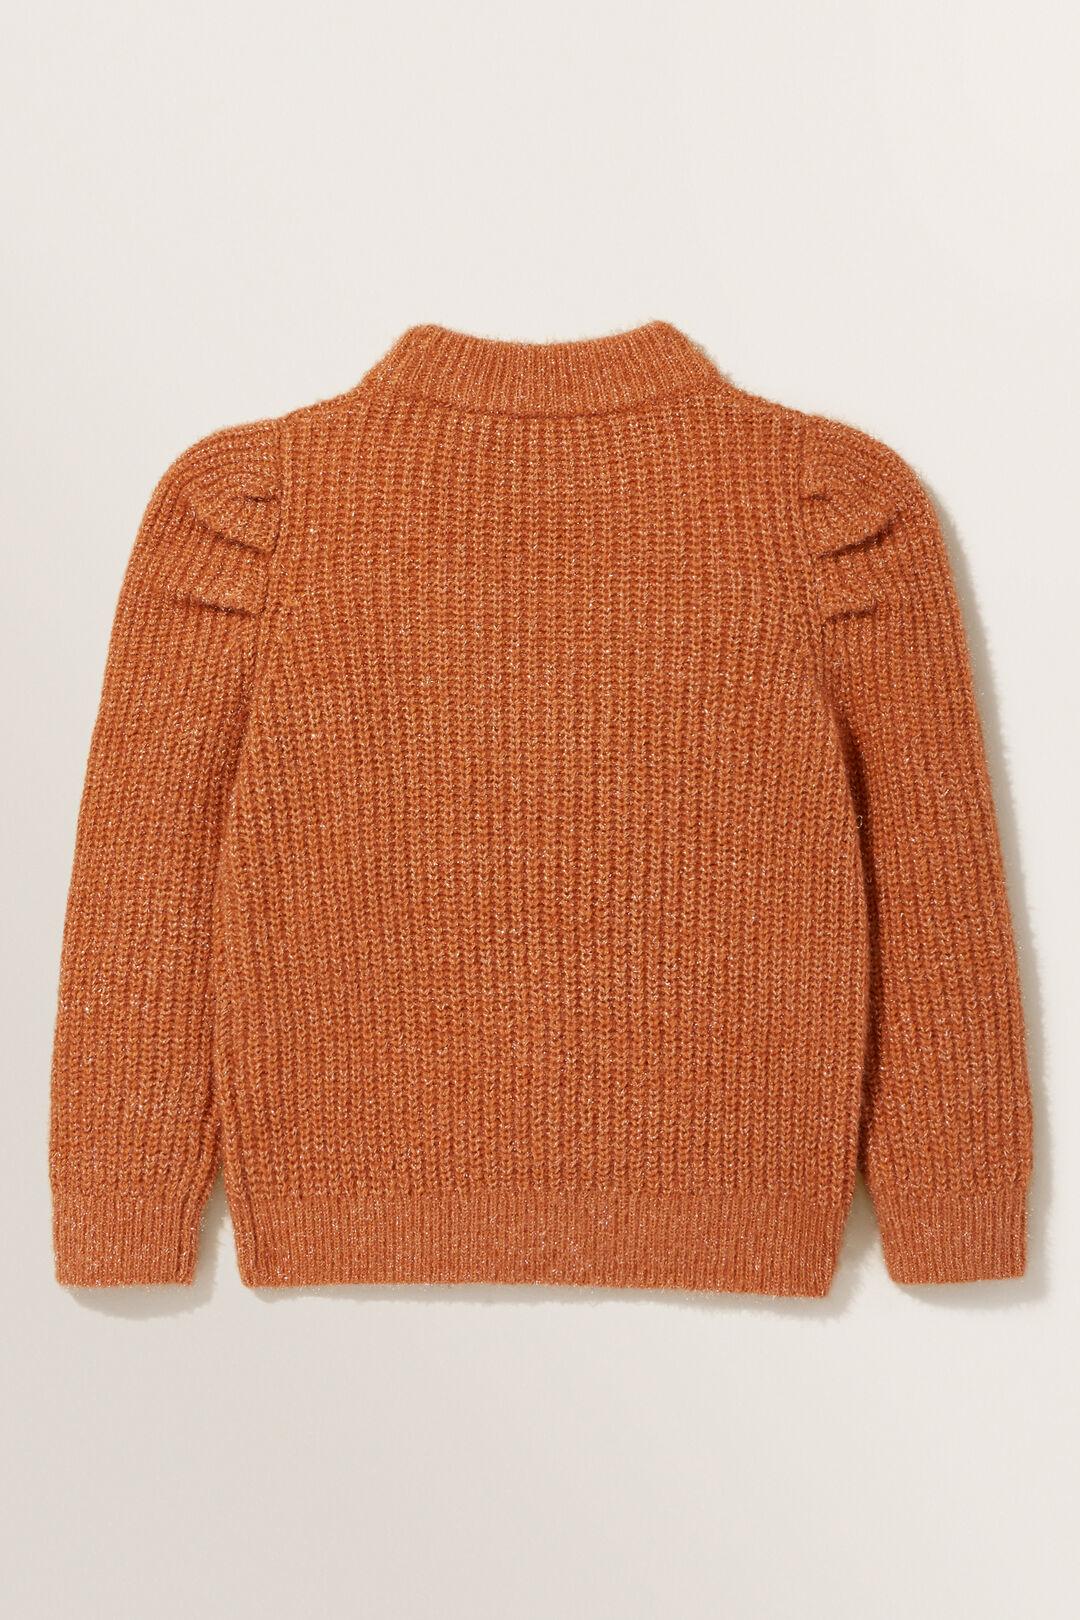 Puff Knit Sweater  Cinnamon  hi-res